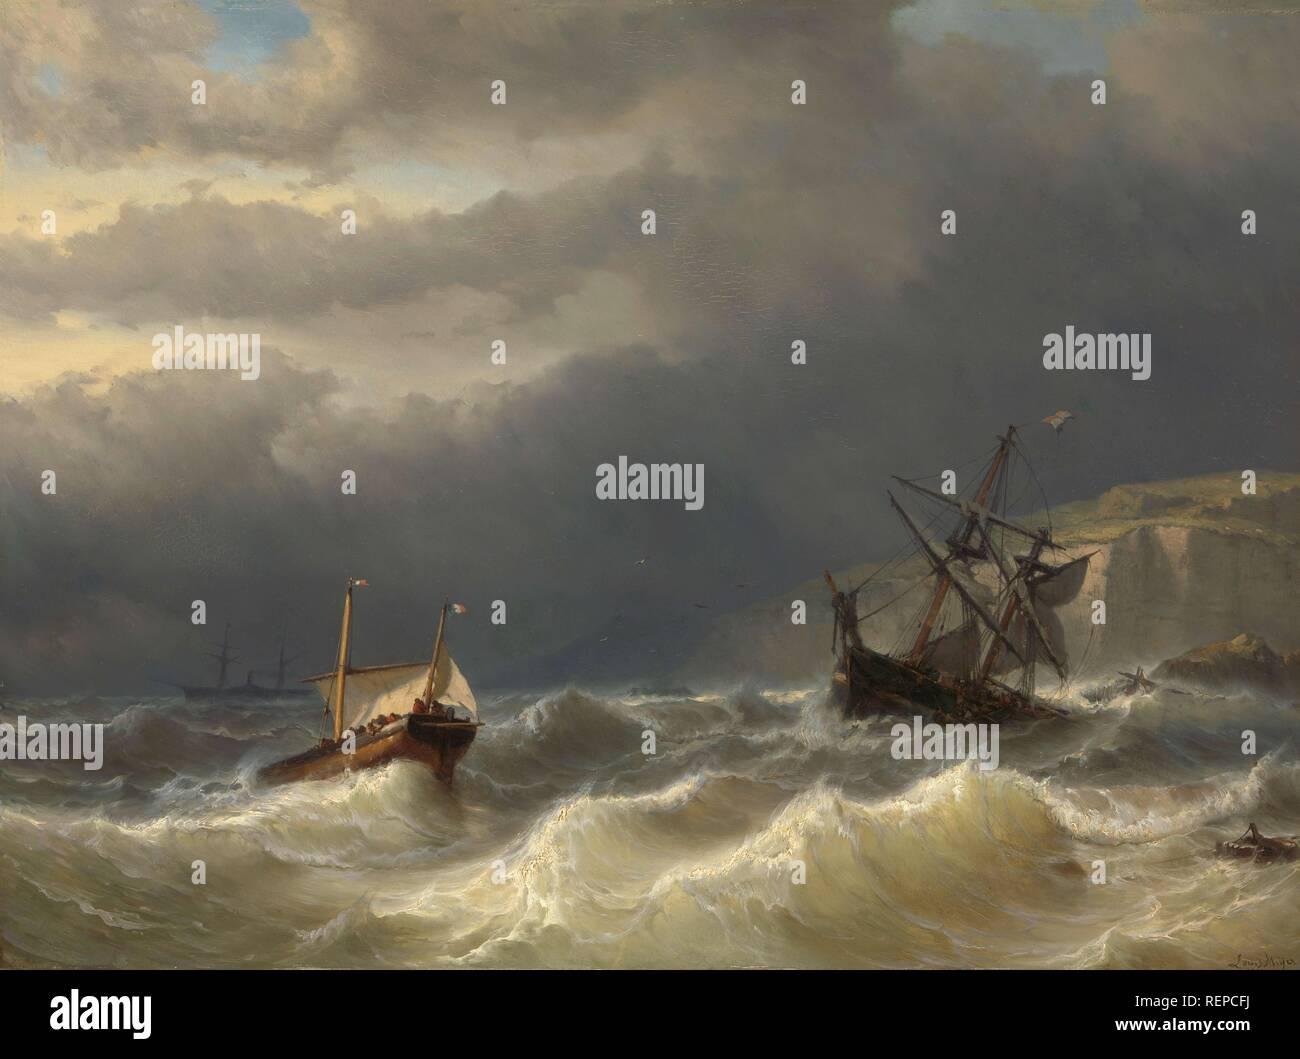 Storm in the Strait of Dover. Dating: 1819 - 1866. Measurements: h 65 cm × w 88 cm; d 7 cm. Museum: Rijksmuseum, Amsterdam. Author: LOUIS MEIJER. - Stock Image